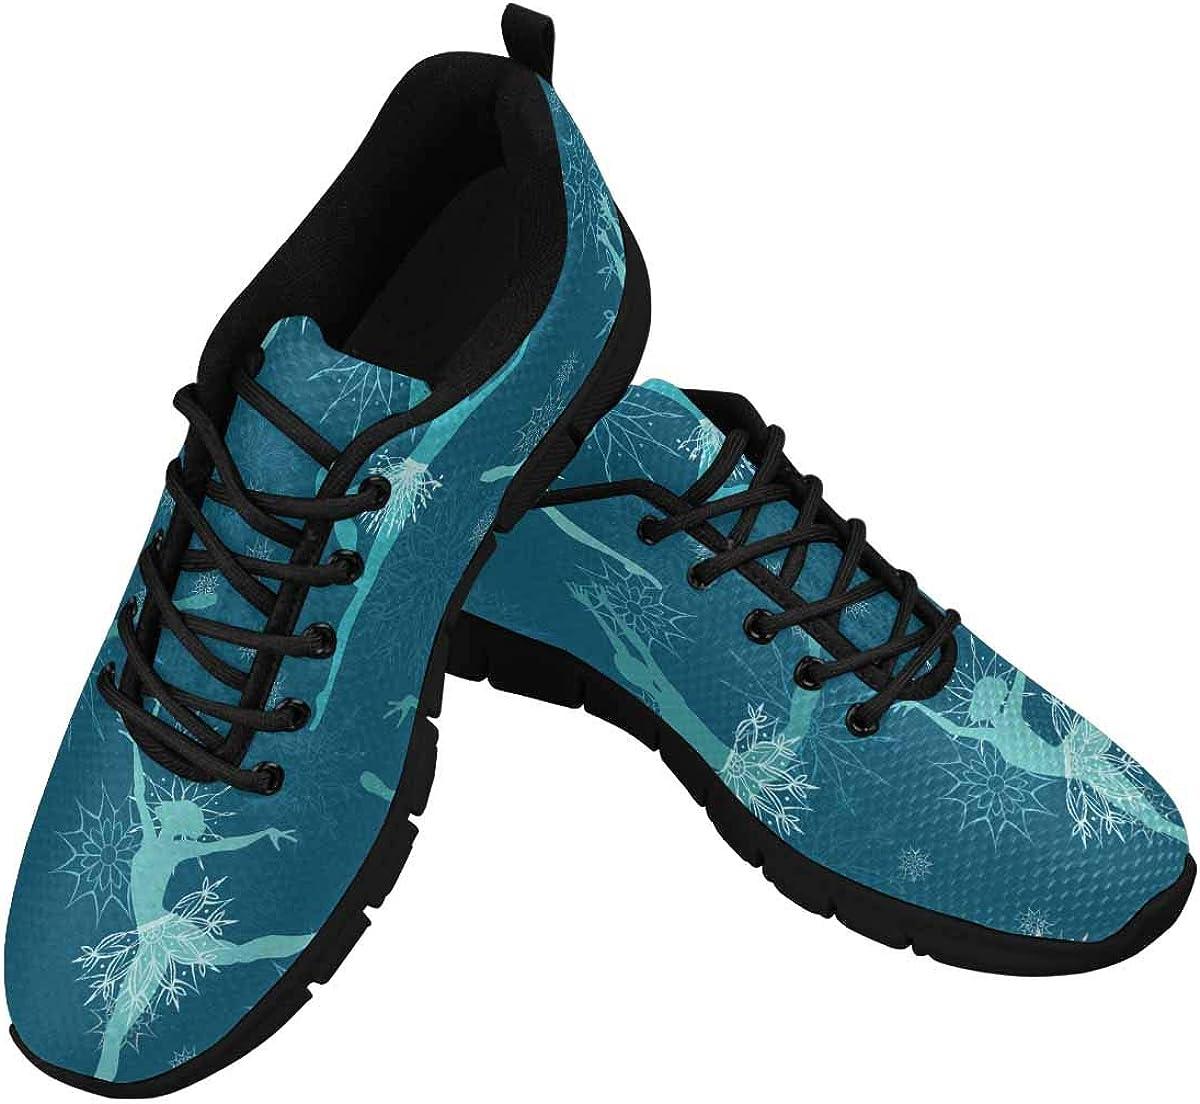 InterestPrint Floral Flower Ballet Pattern Women's Lace Up Running Comfort Sports Sneakers